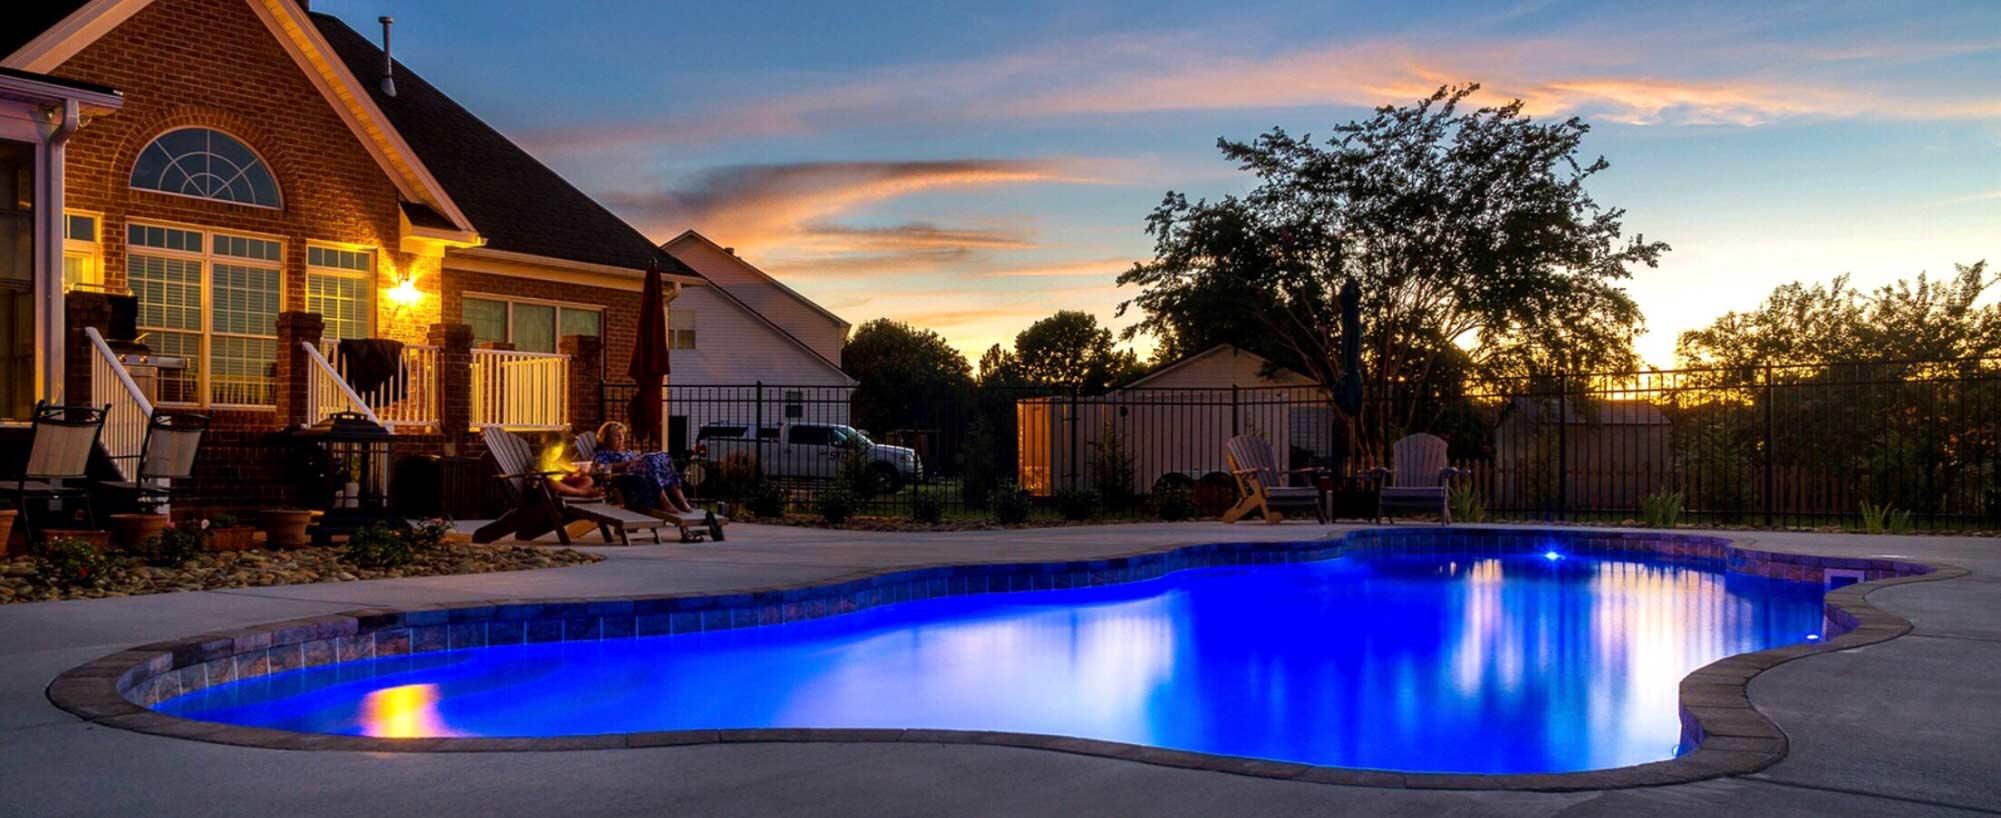 swimming pool led lights latham pools